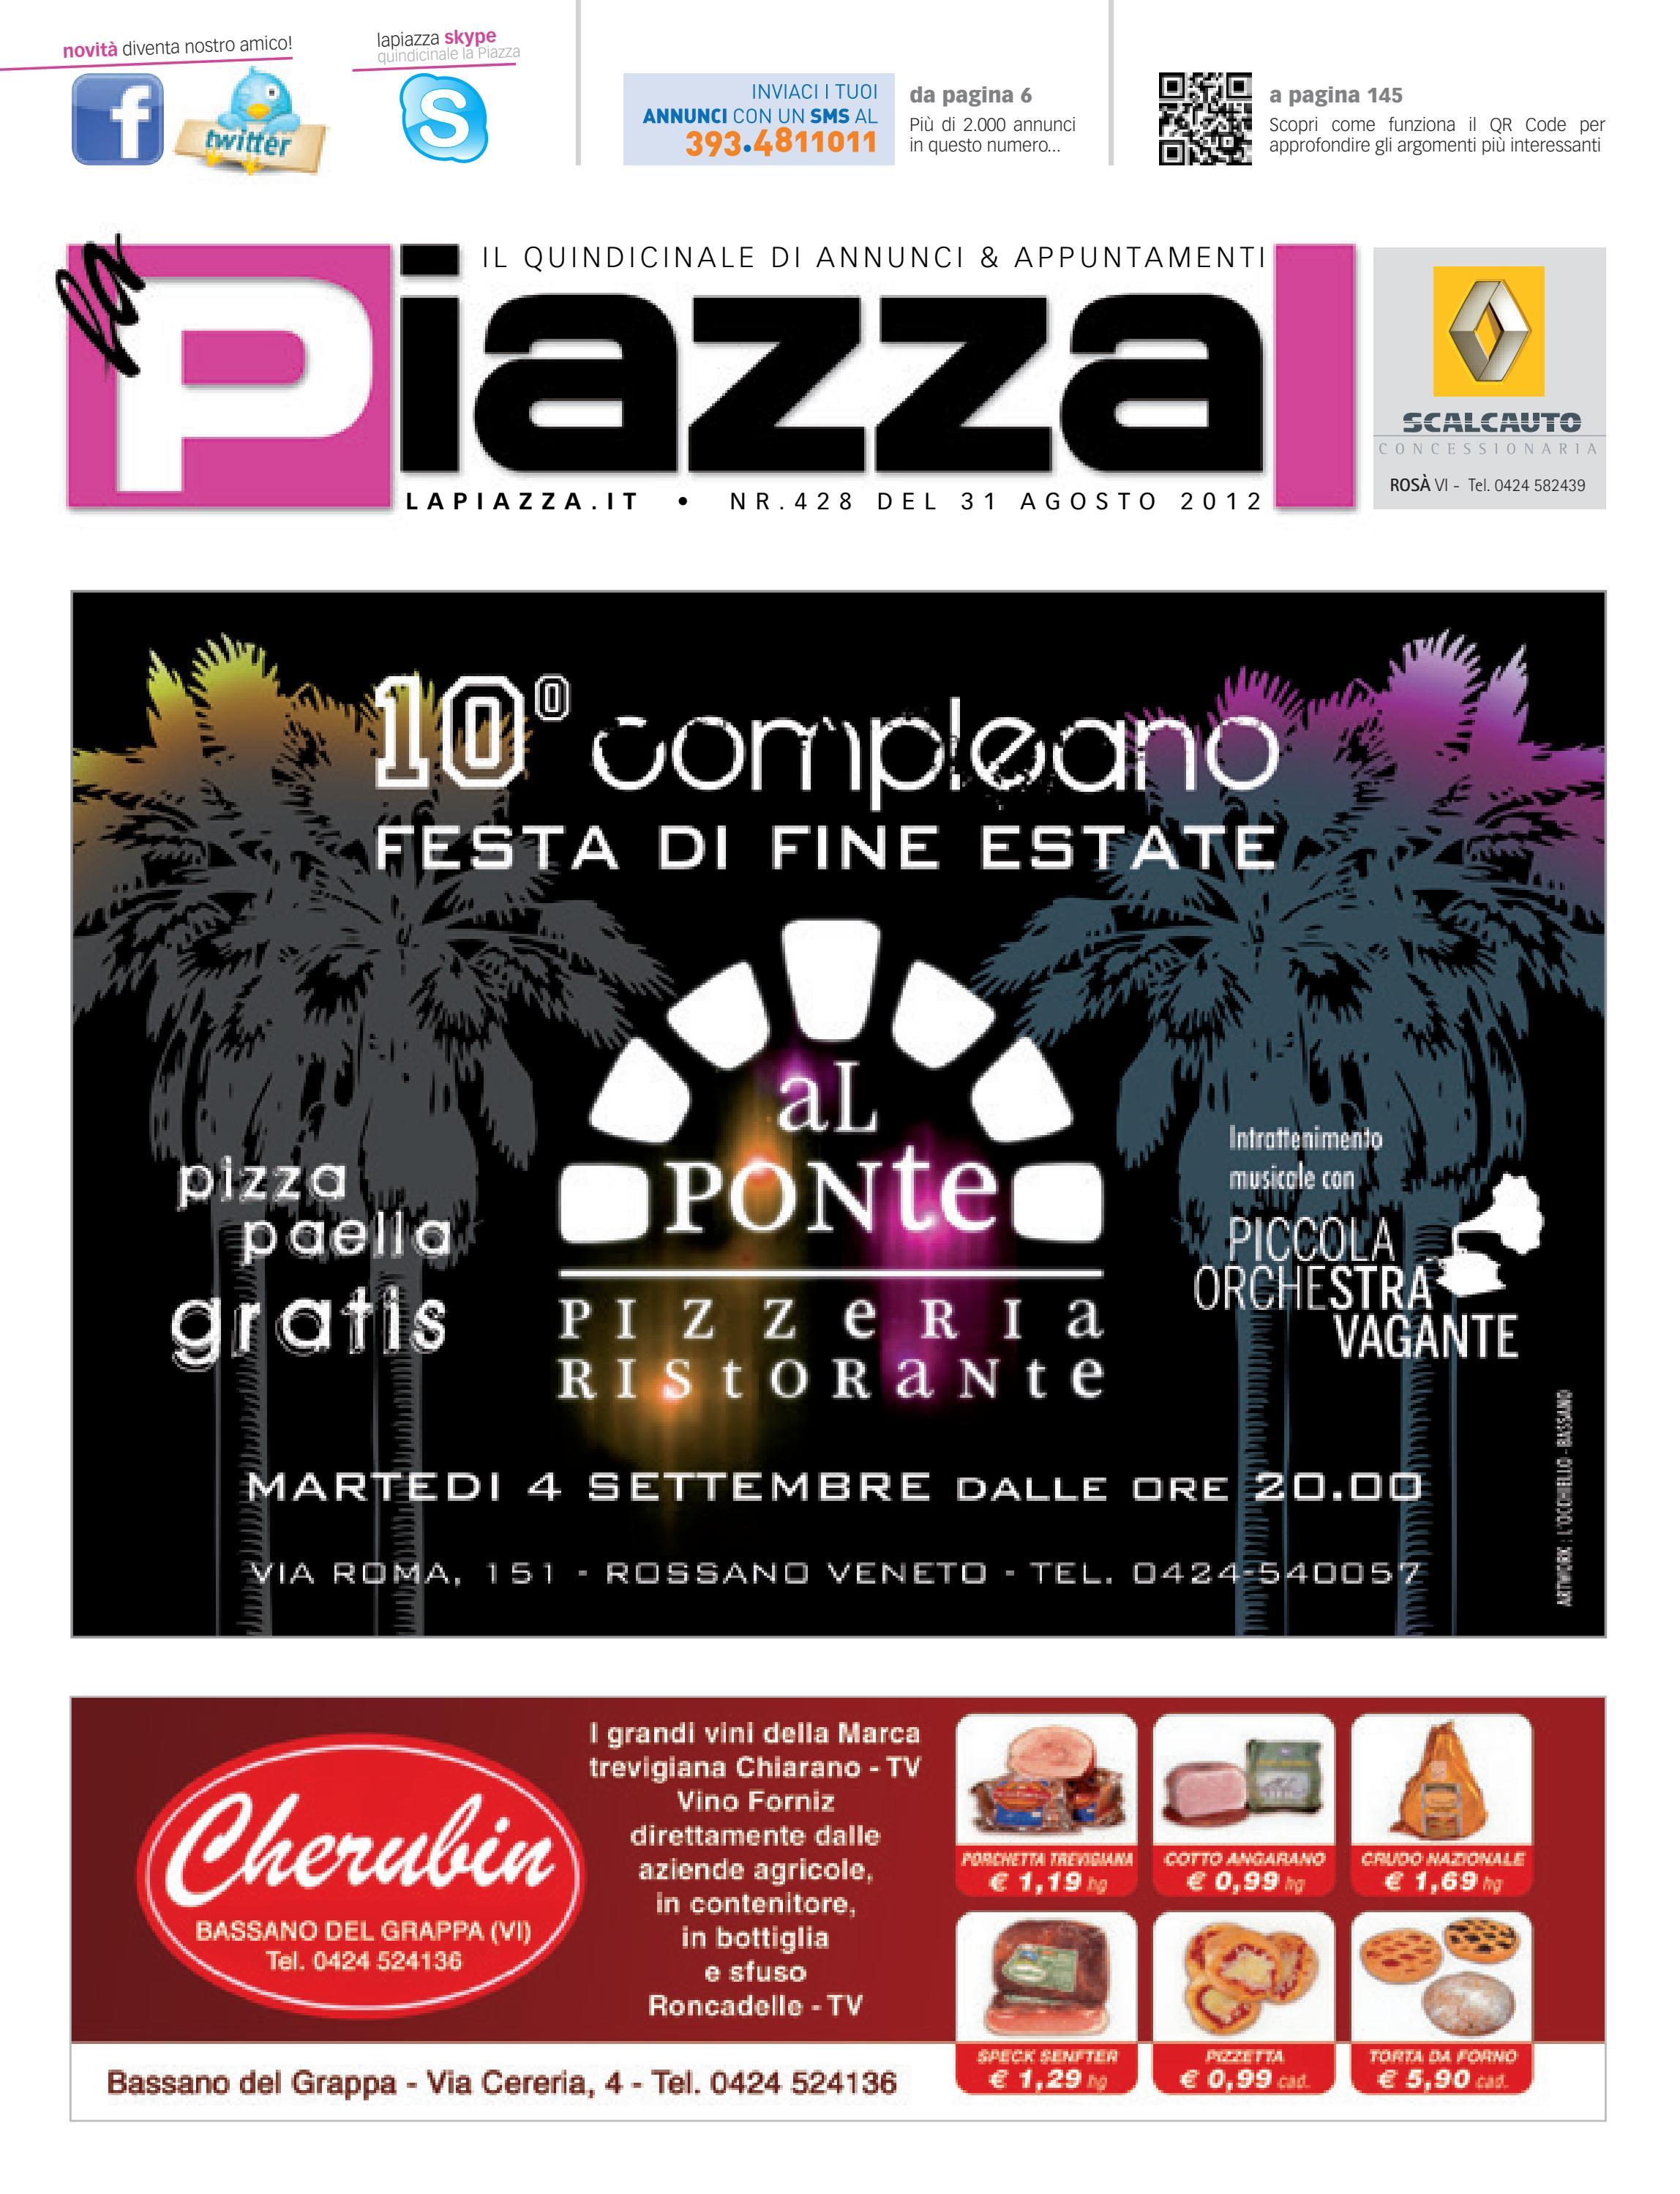 la Piazza 428 by la Piazza di Cavazzin Daniele - issuu 20f6c5c9499